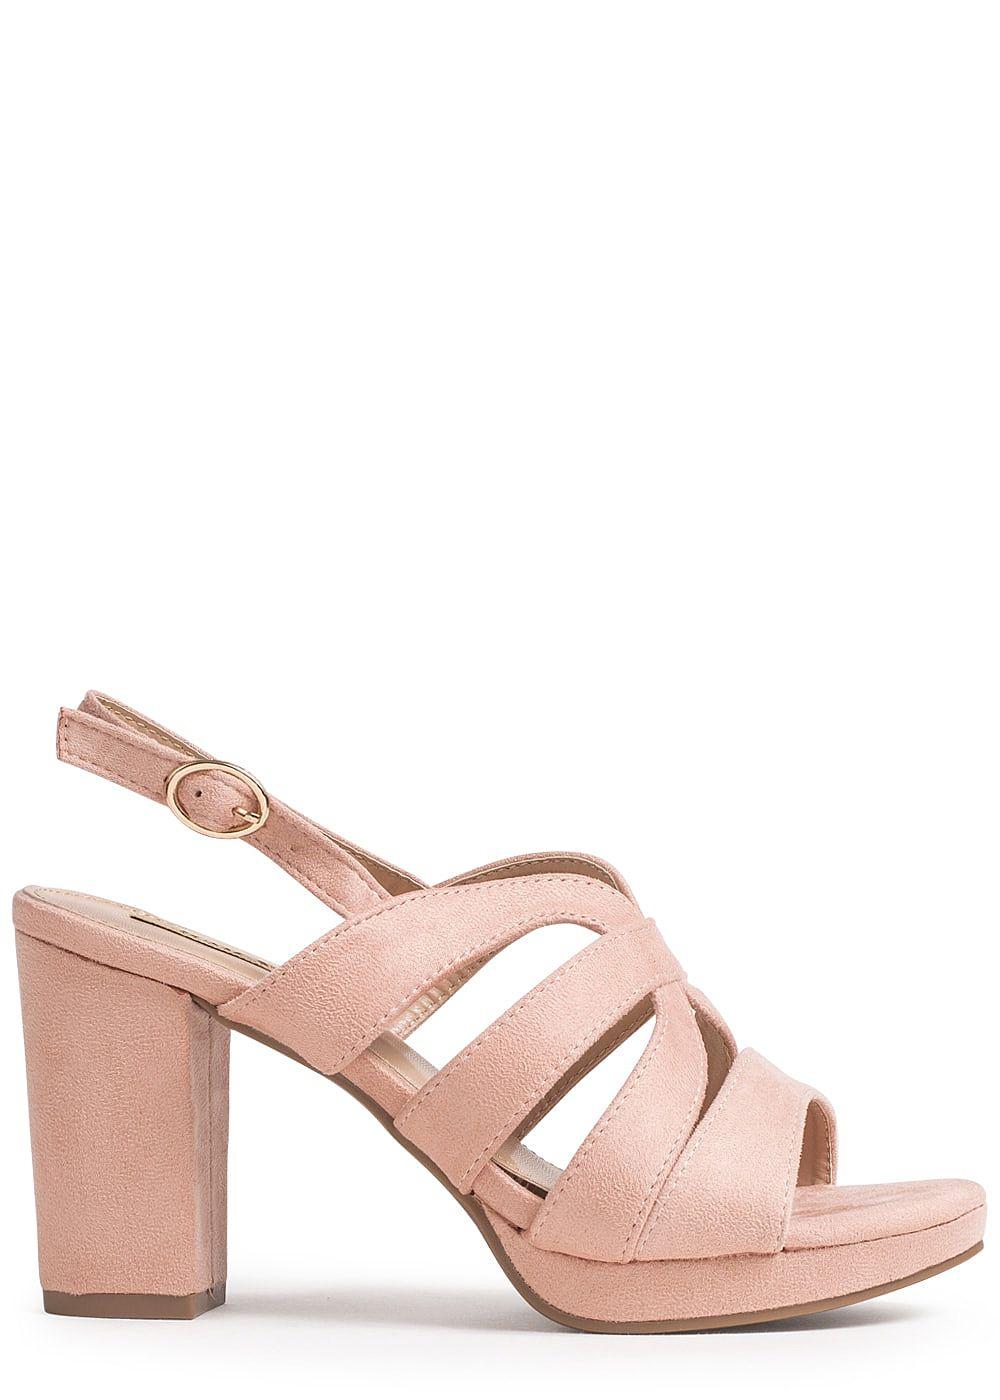 5cm Lifestyle 9 Sandalette Absatz Kunstleder Damen Rosa Seventyseven Schuh SULpVGqzjM